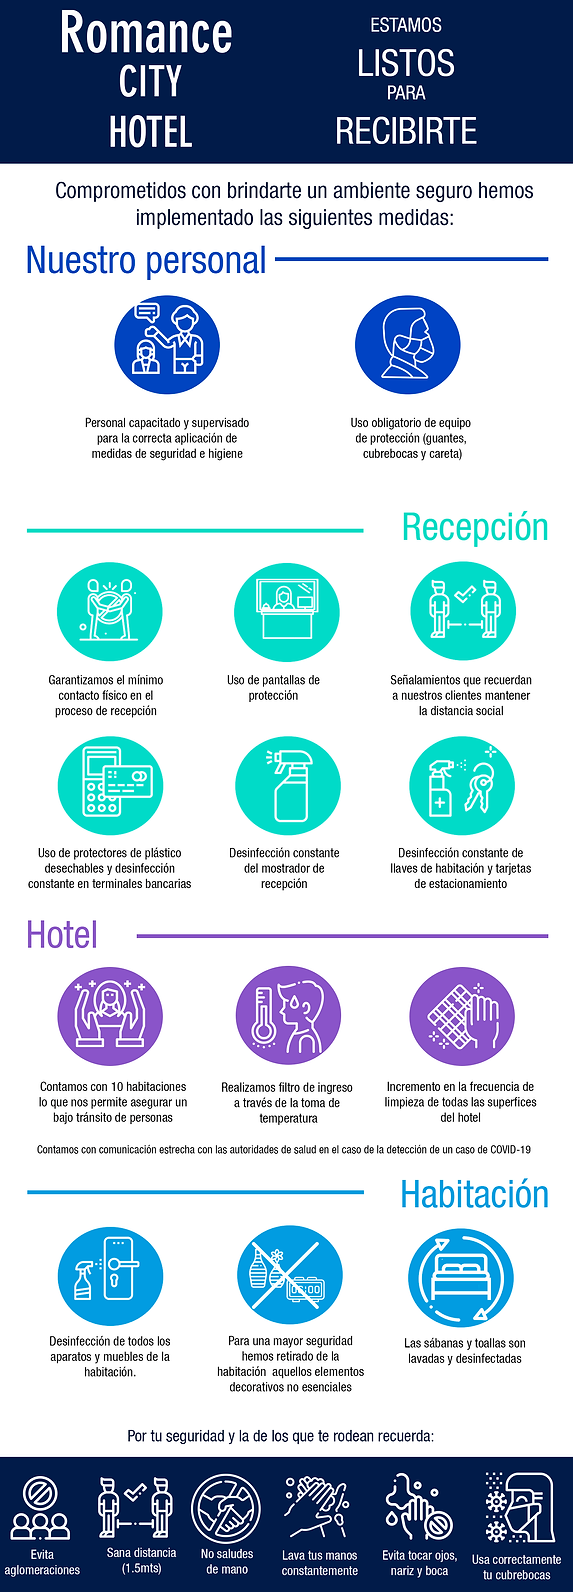 Medidas sanitarias implementadas en Hotel Romance